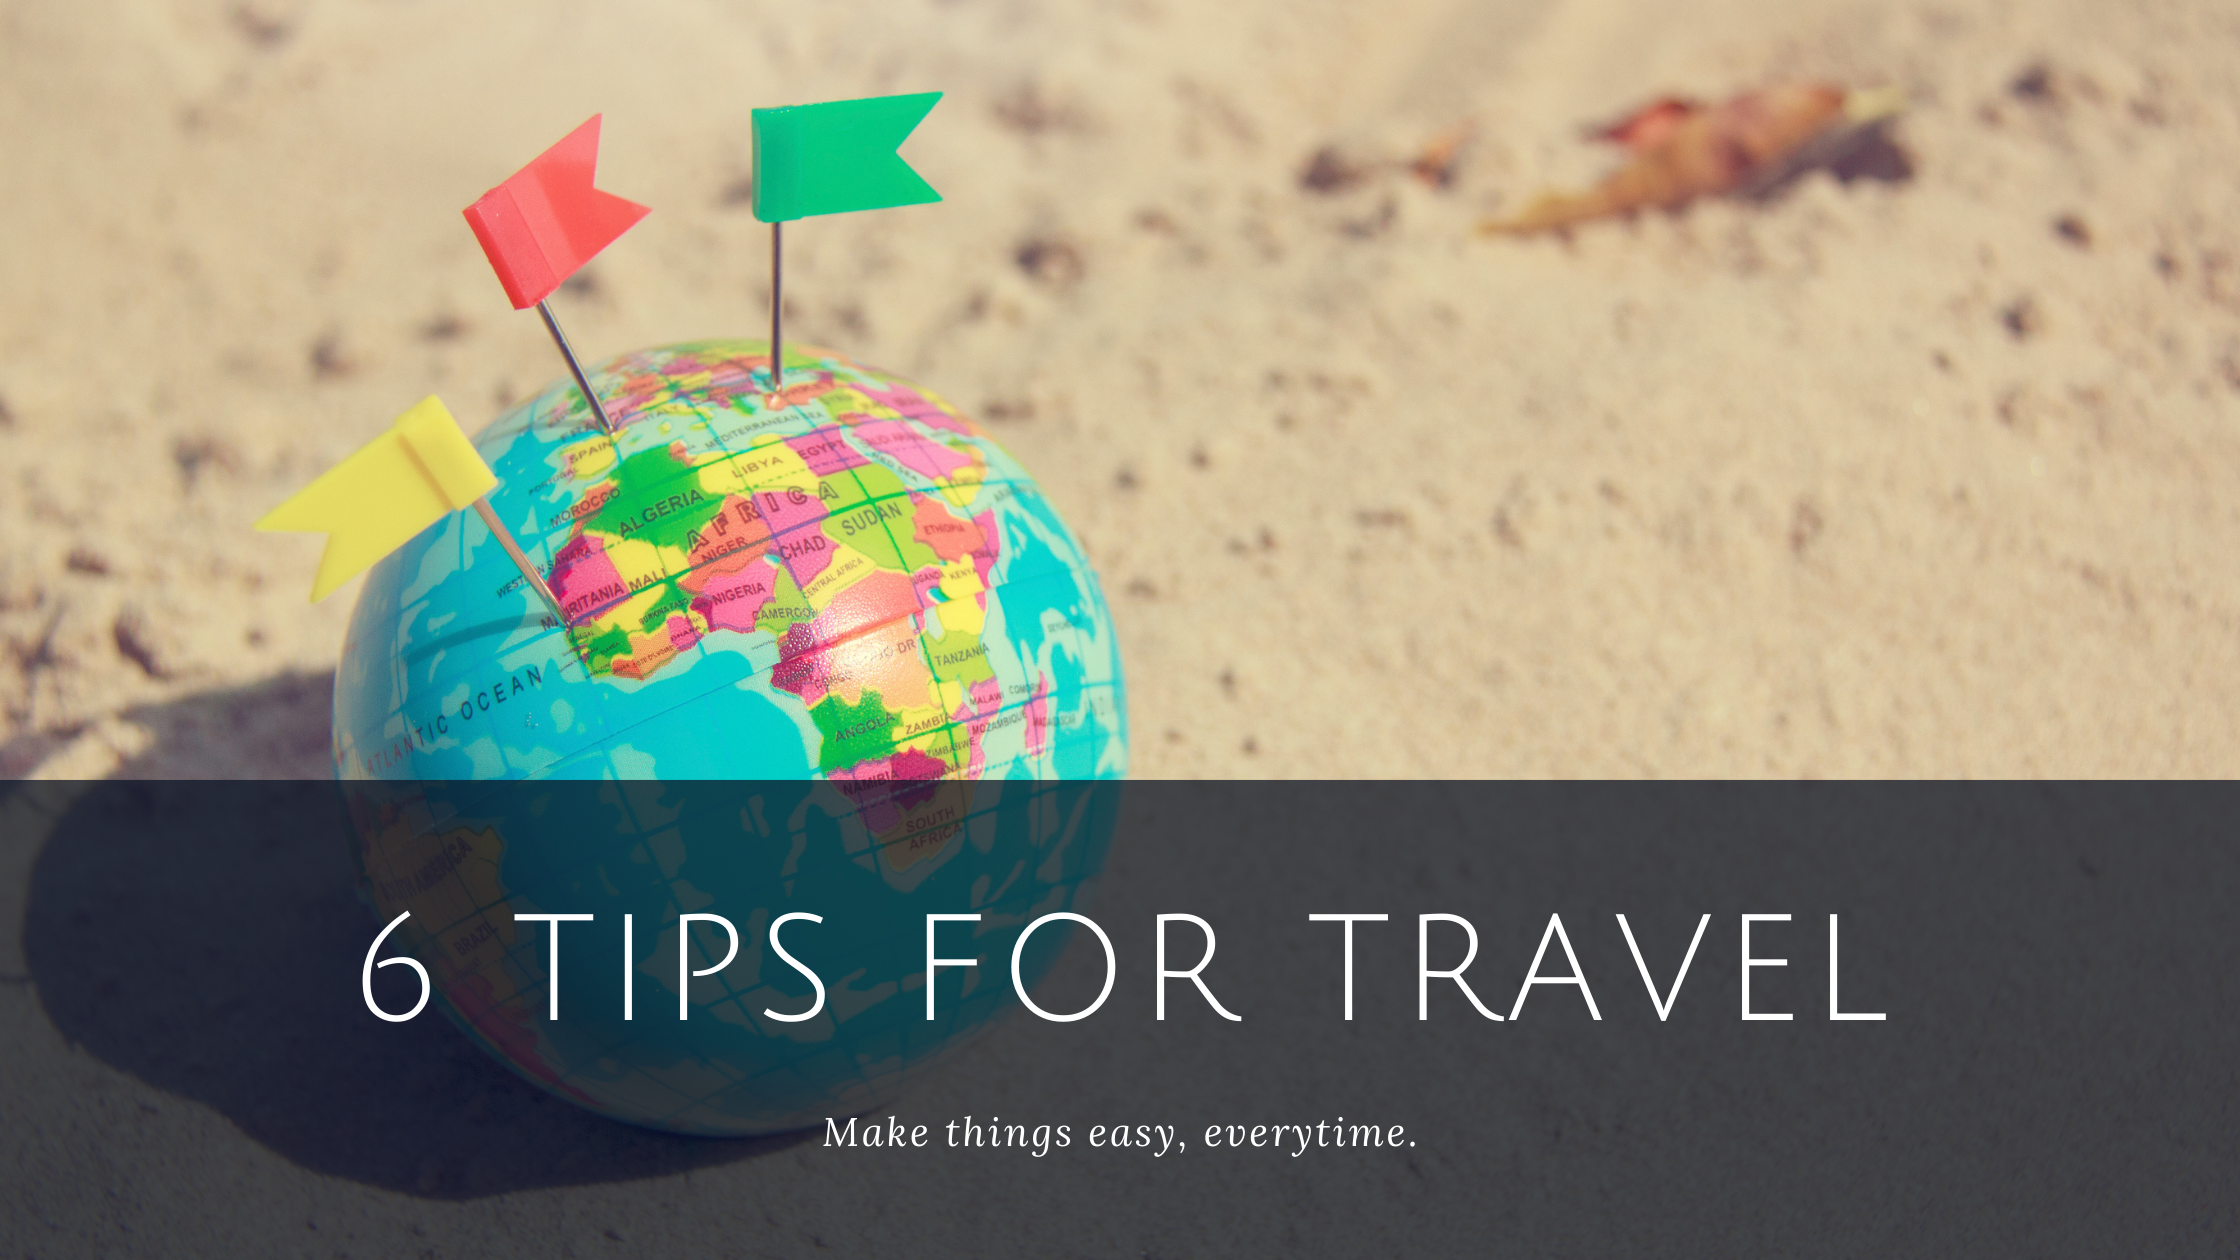 6 Tips for Travel